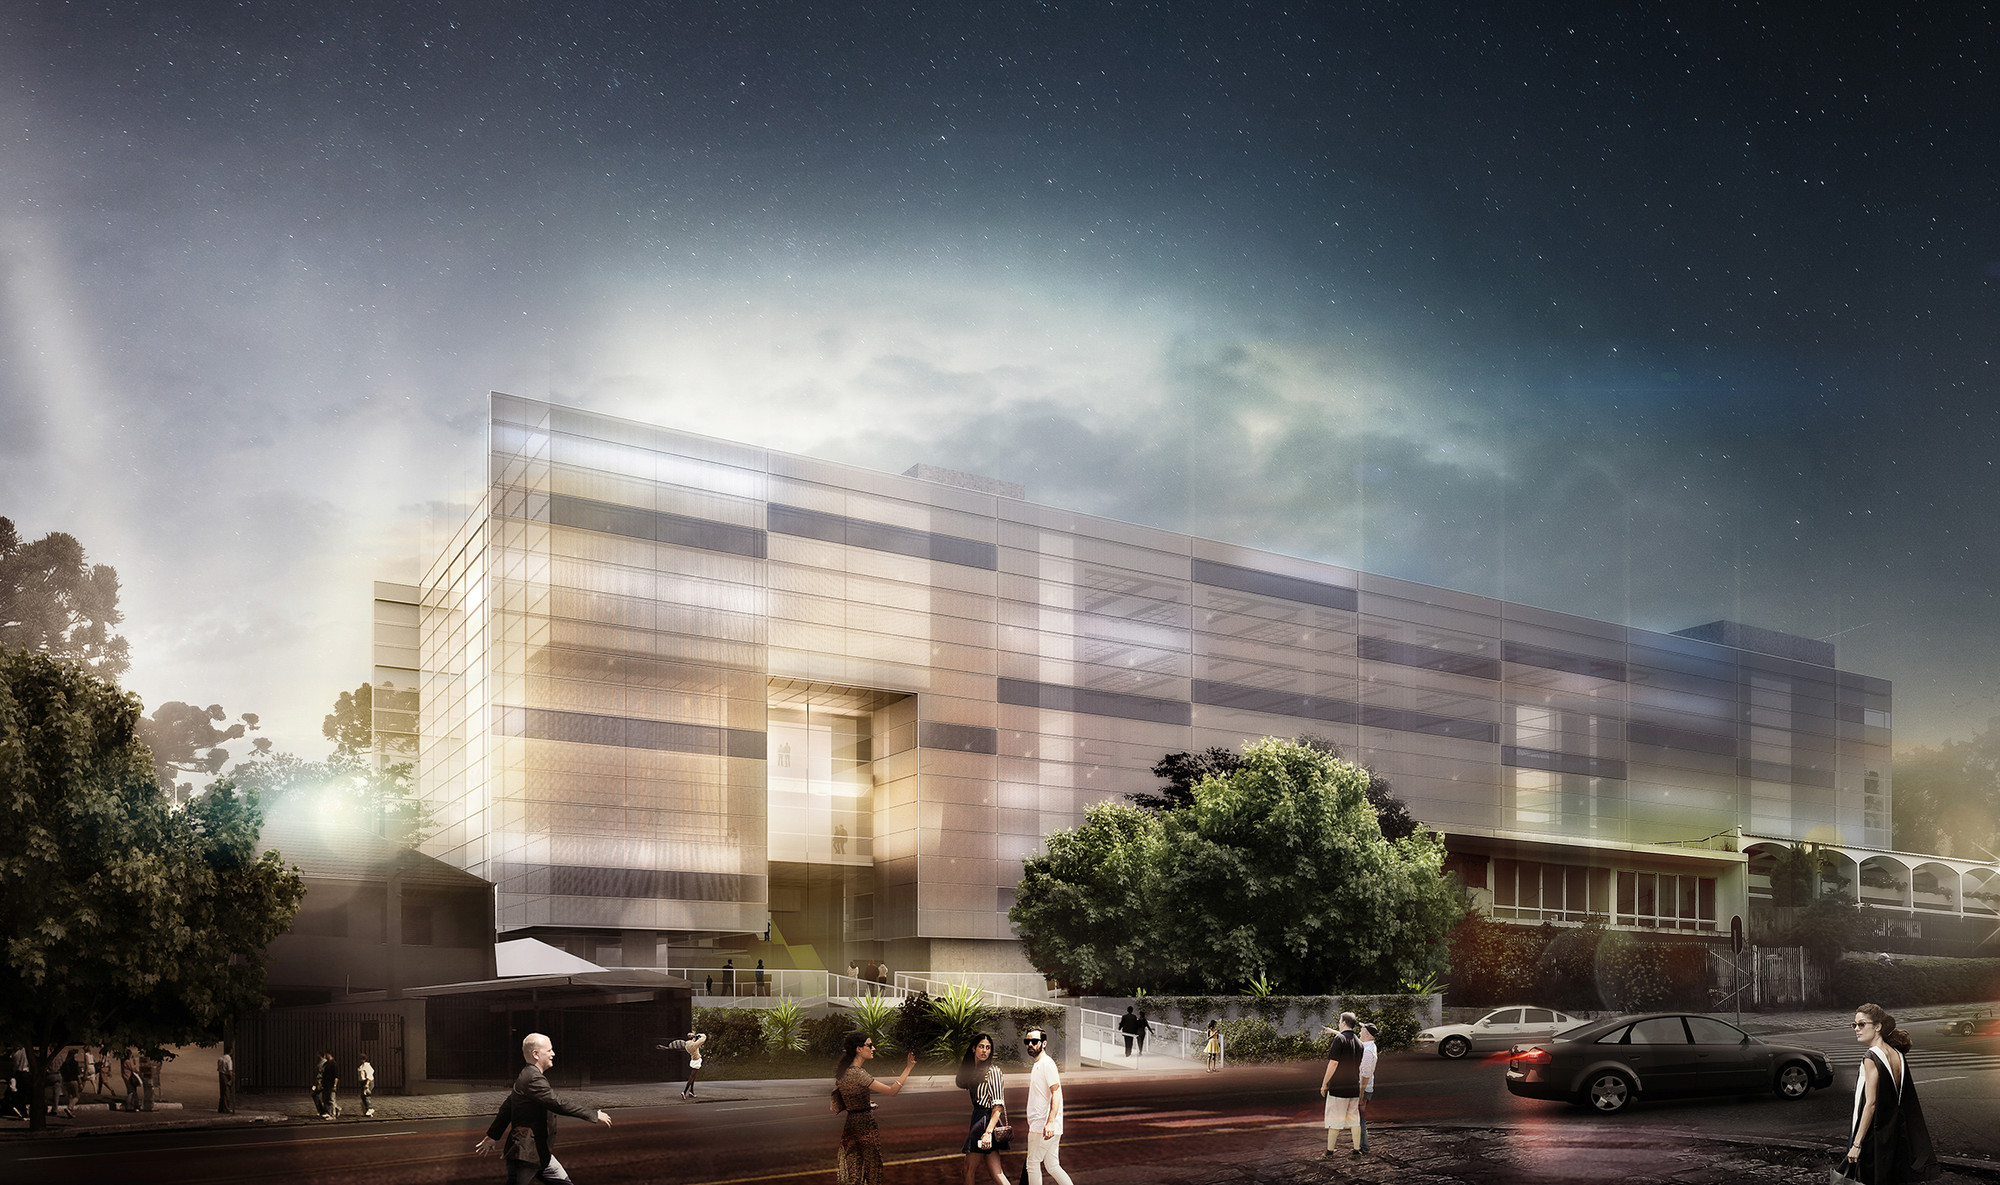 Primeiro lugar no concurso para Nova Sede do Clube Curitibano / Arqbox Arquitetura , Fachada principal. Image Courtesy of Arqbox